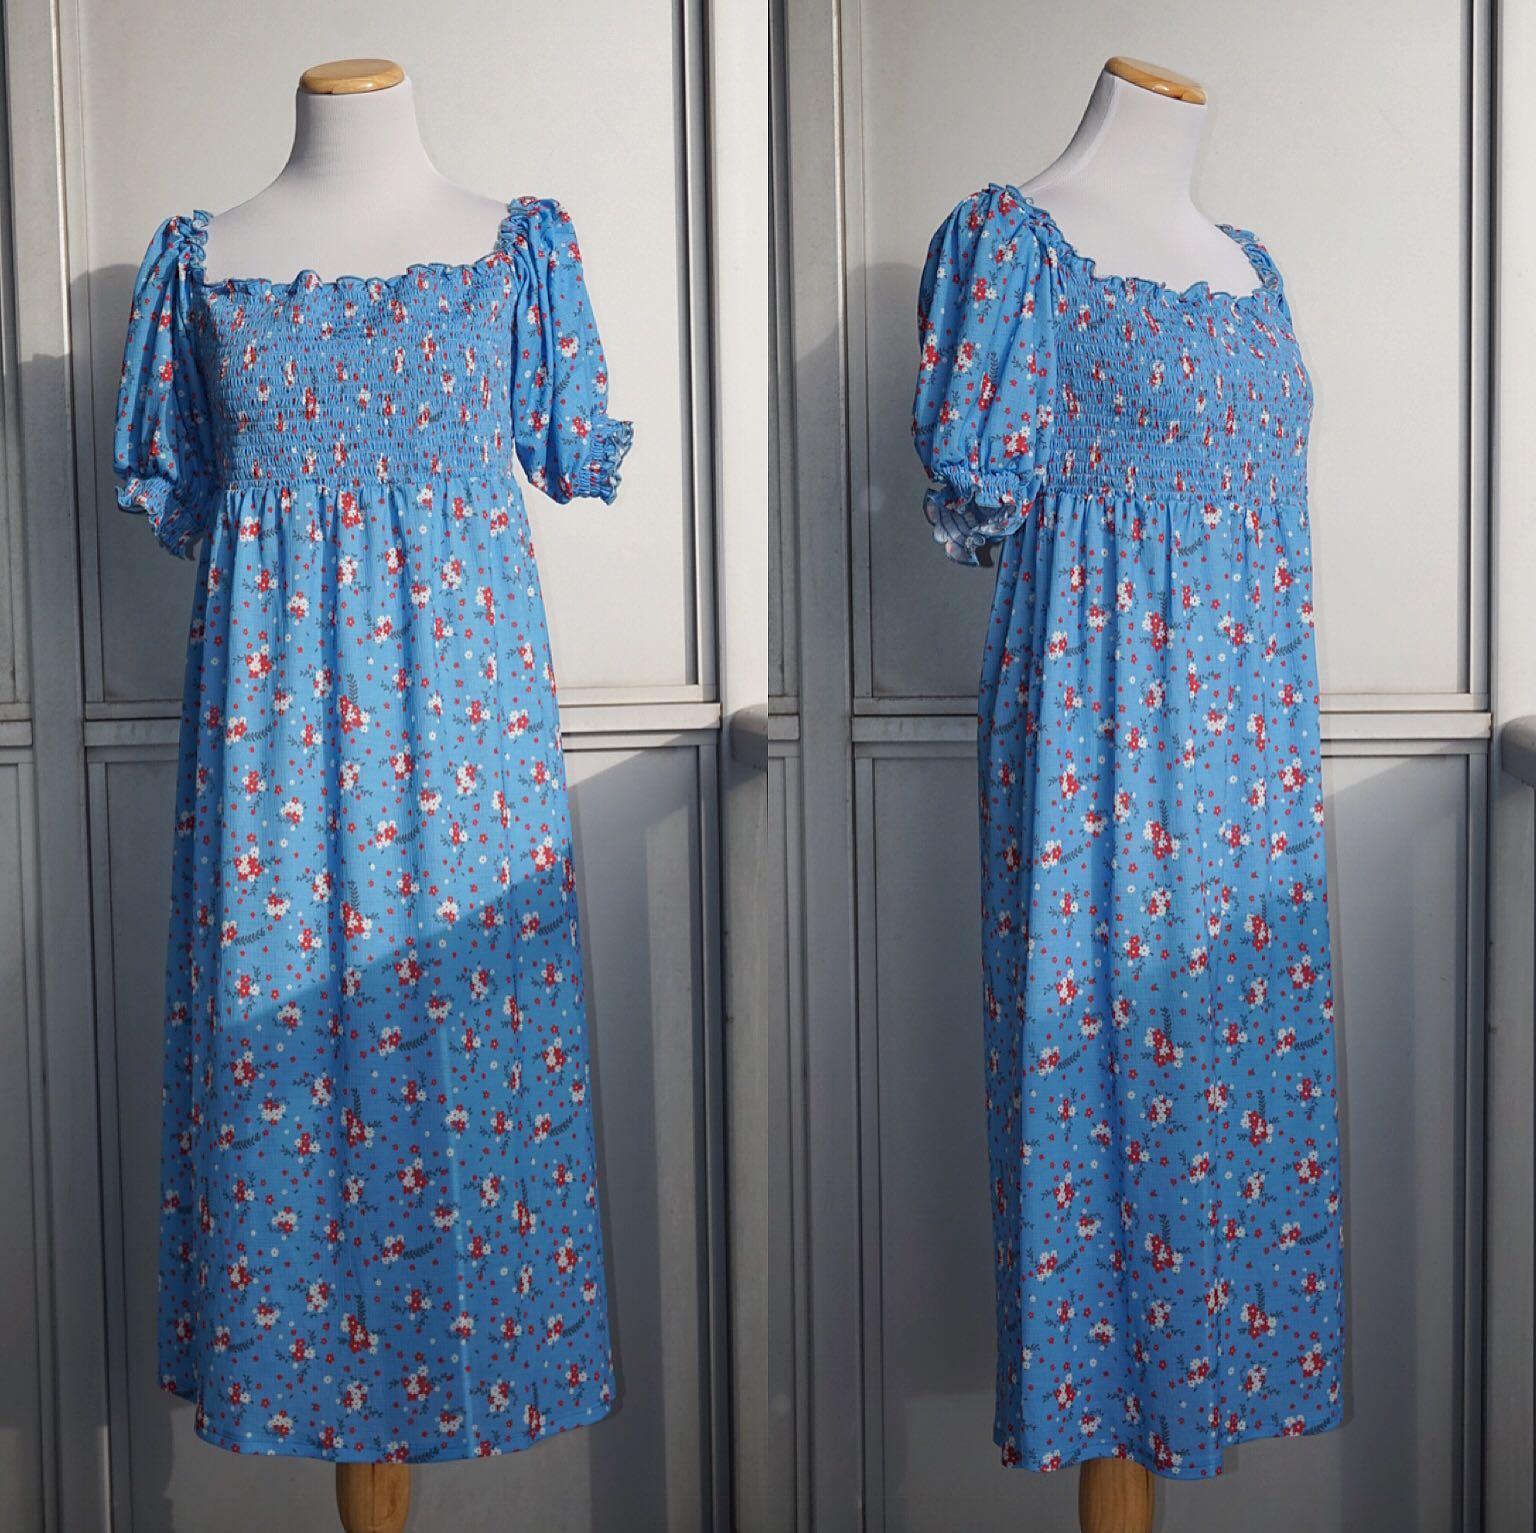 *NWT* ASOS Off-the-Shoulder Floral Smocked Midi Dress Size 8